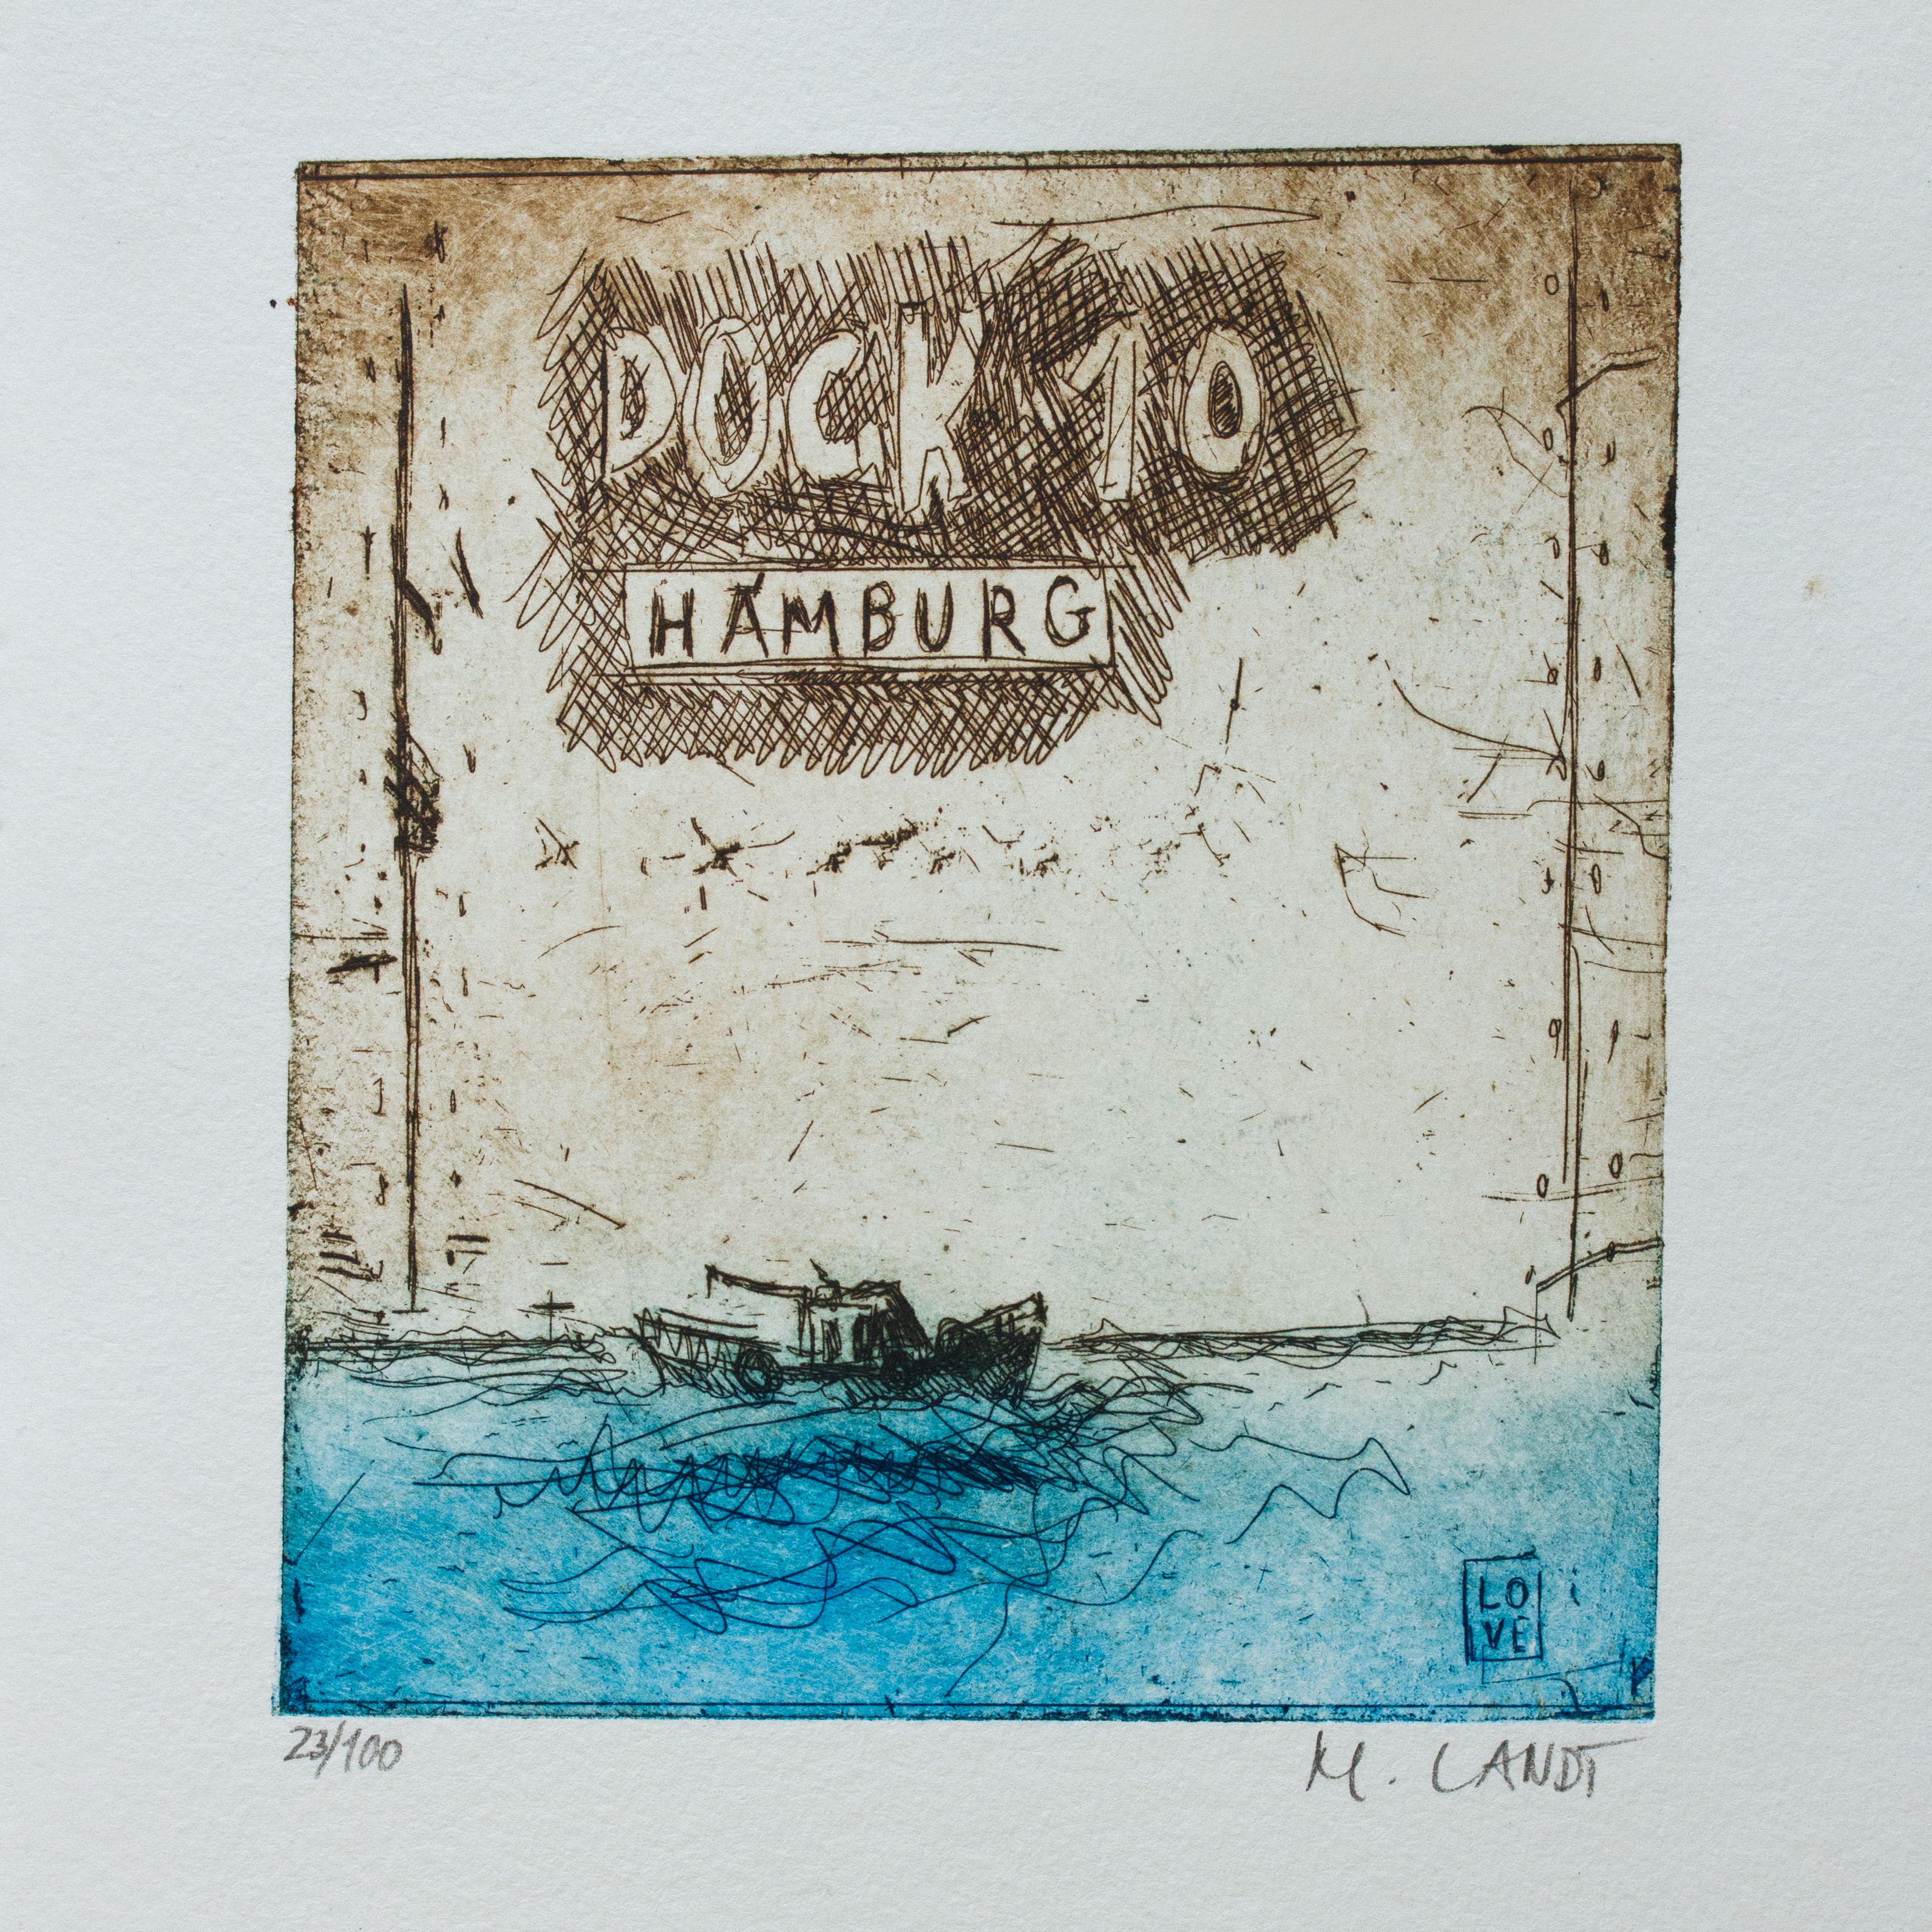 Hamburg - Dock 10